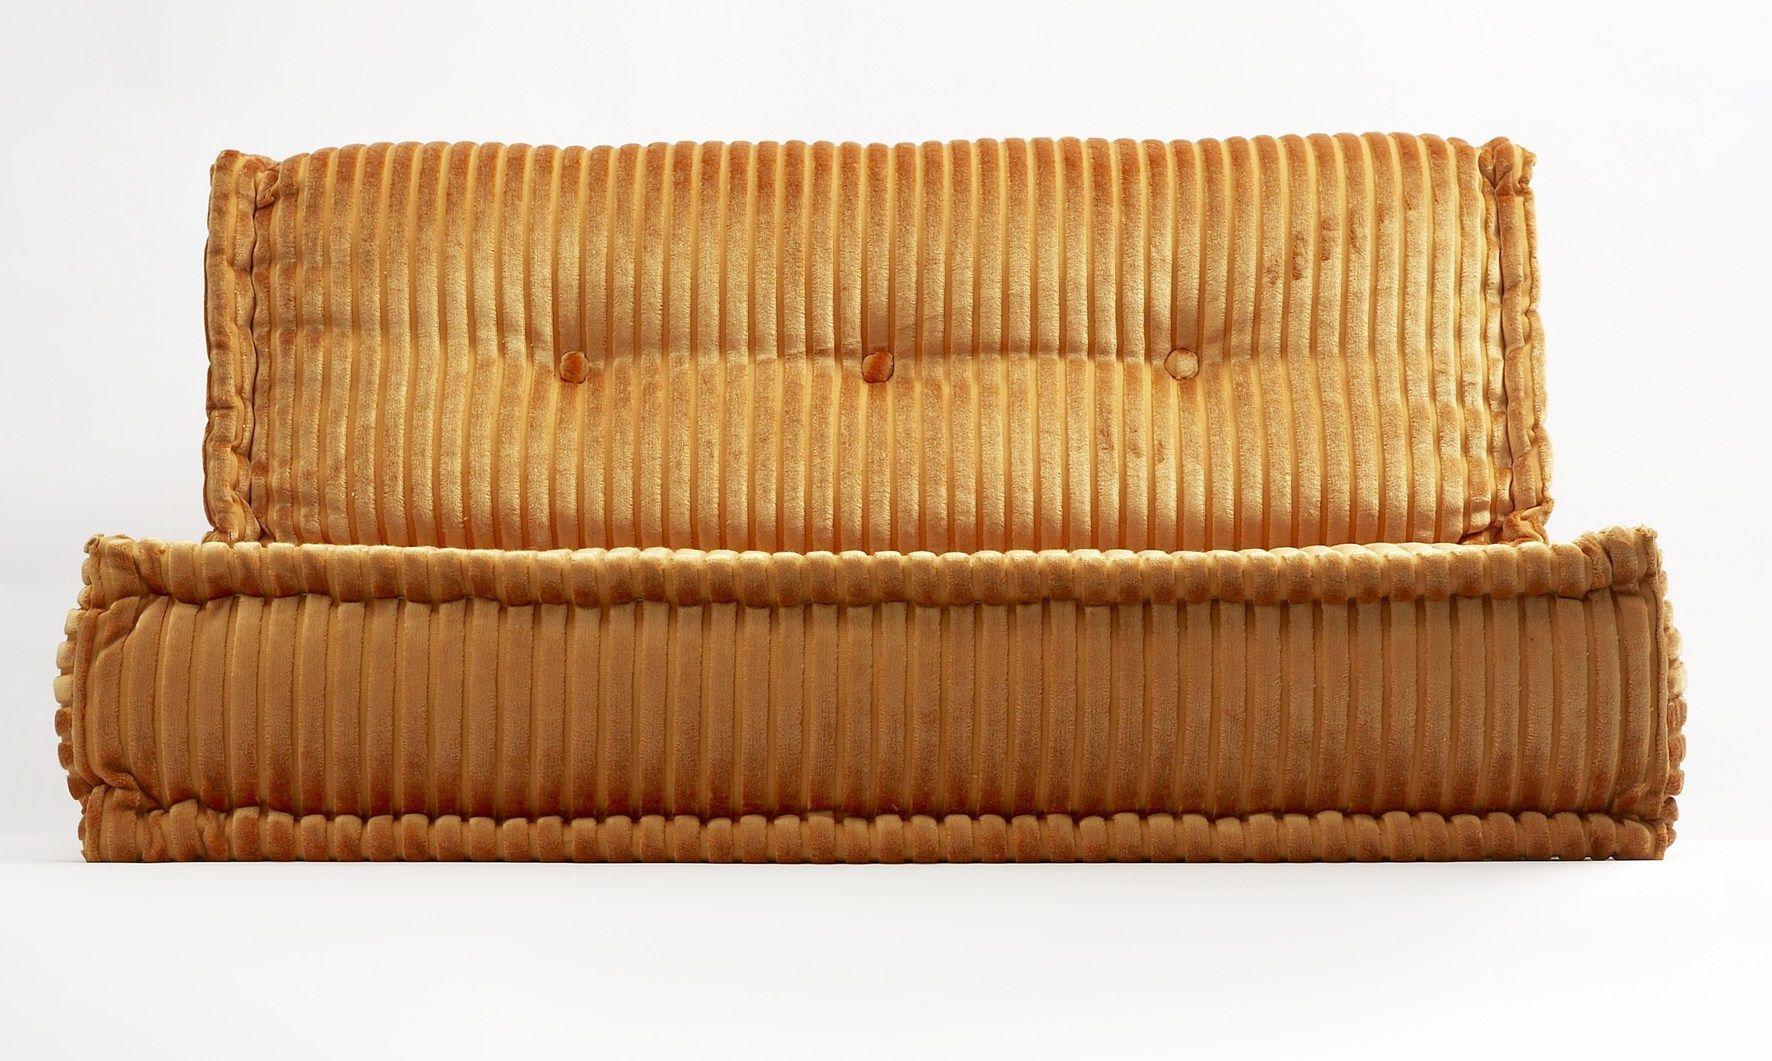 Canap composable en tissu mah jong missoni home by roche - Canape roche bobois mah jong ...